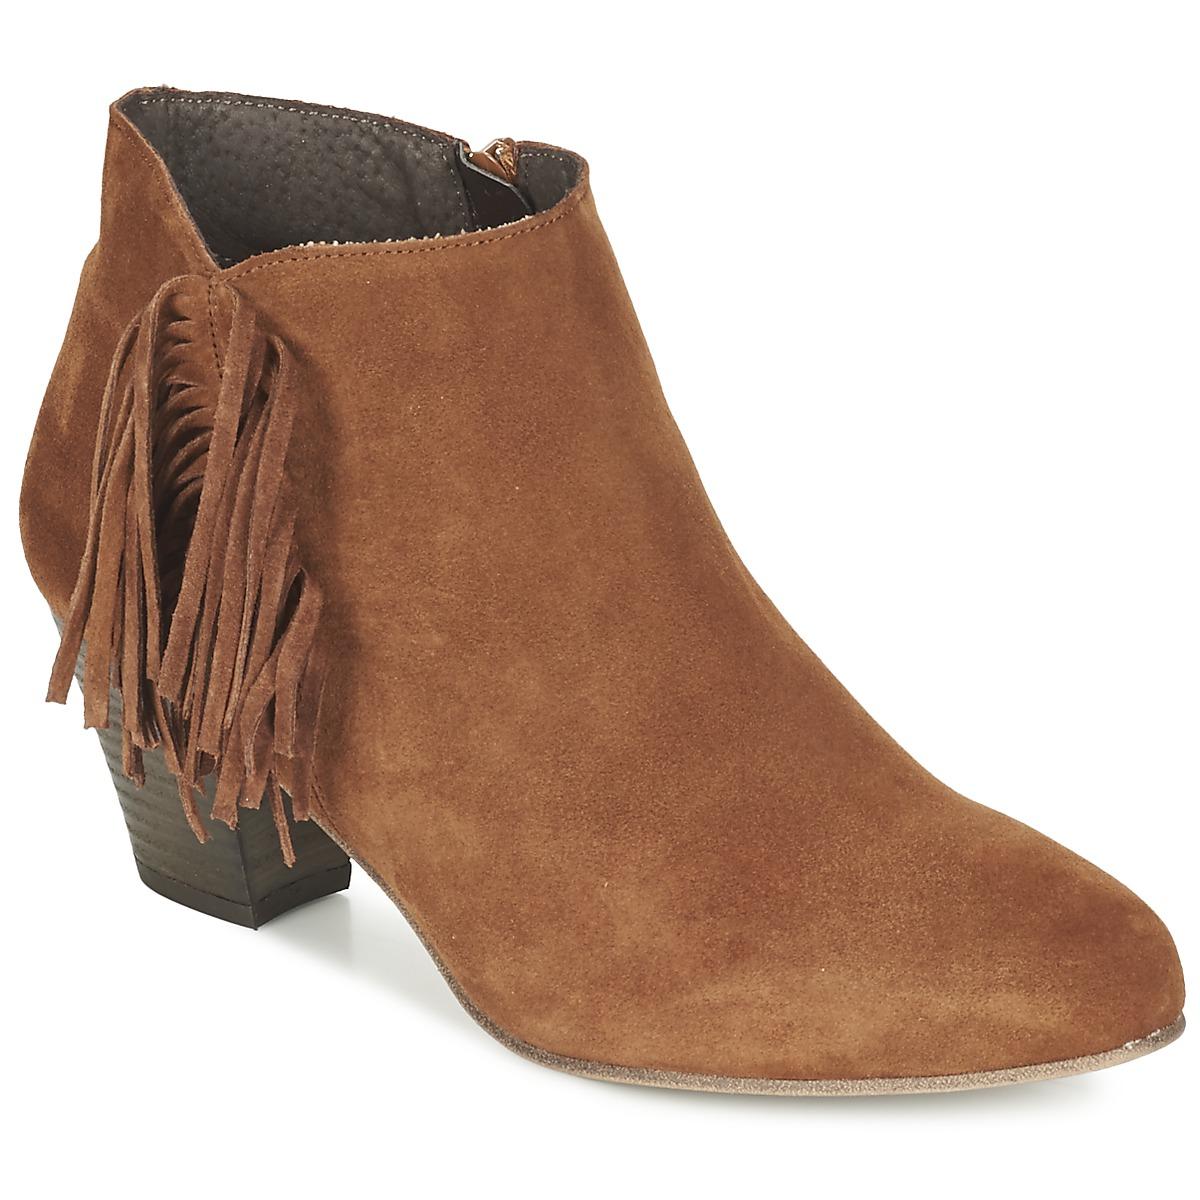 Betty London FIANIDE Noisette - Kostenloser Versand bei Spartoode ! - Schuhe Low Boots Damen 47,50 €